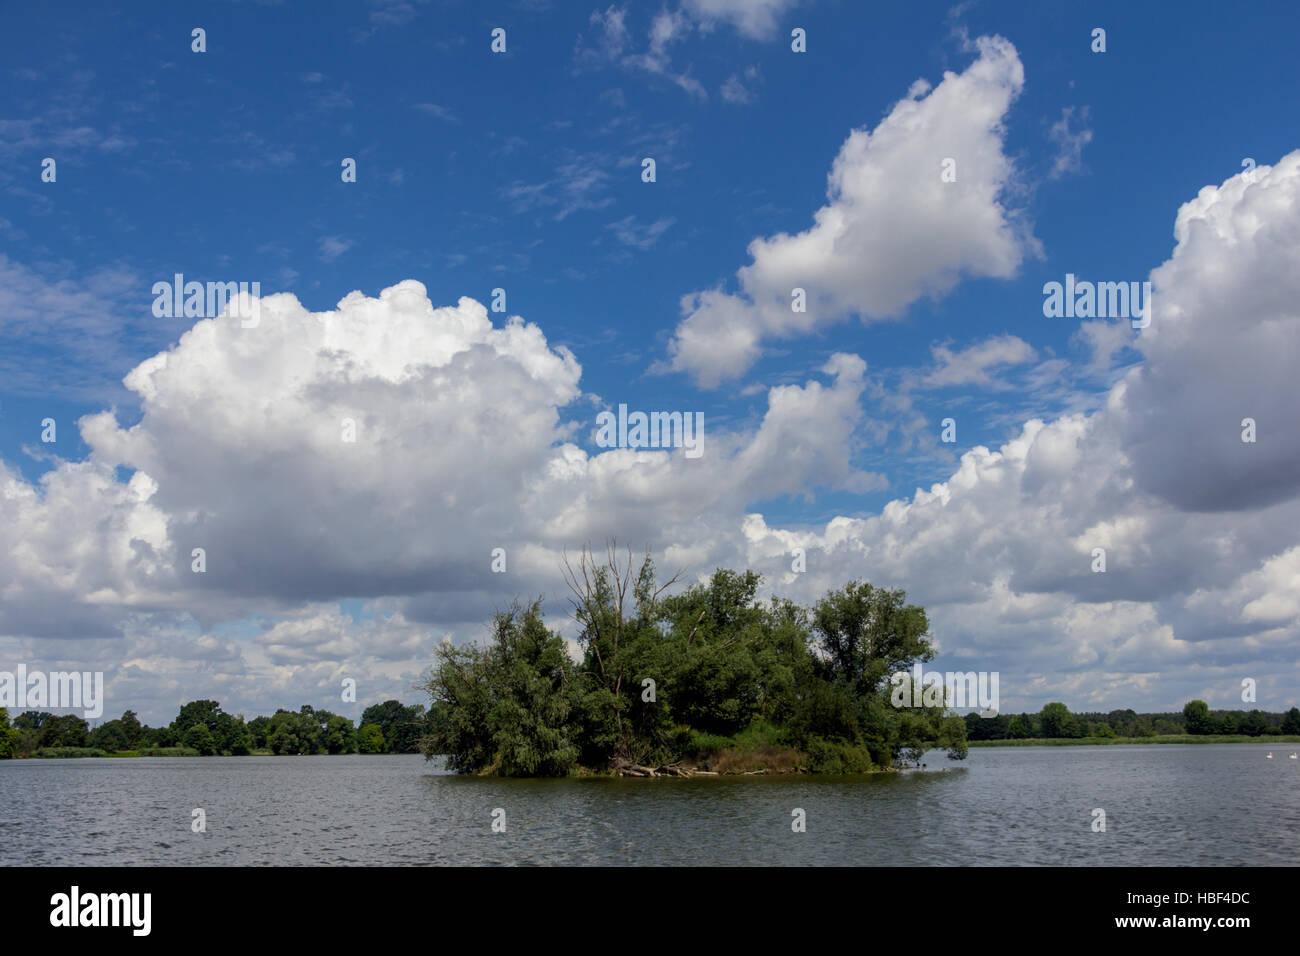 Himmel - Stock Image